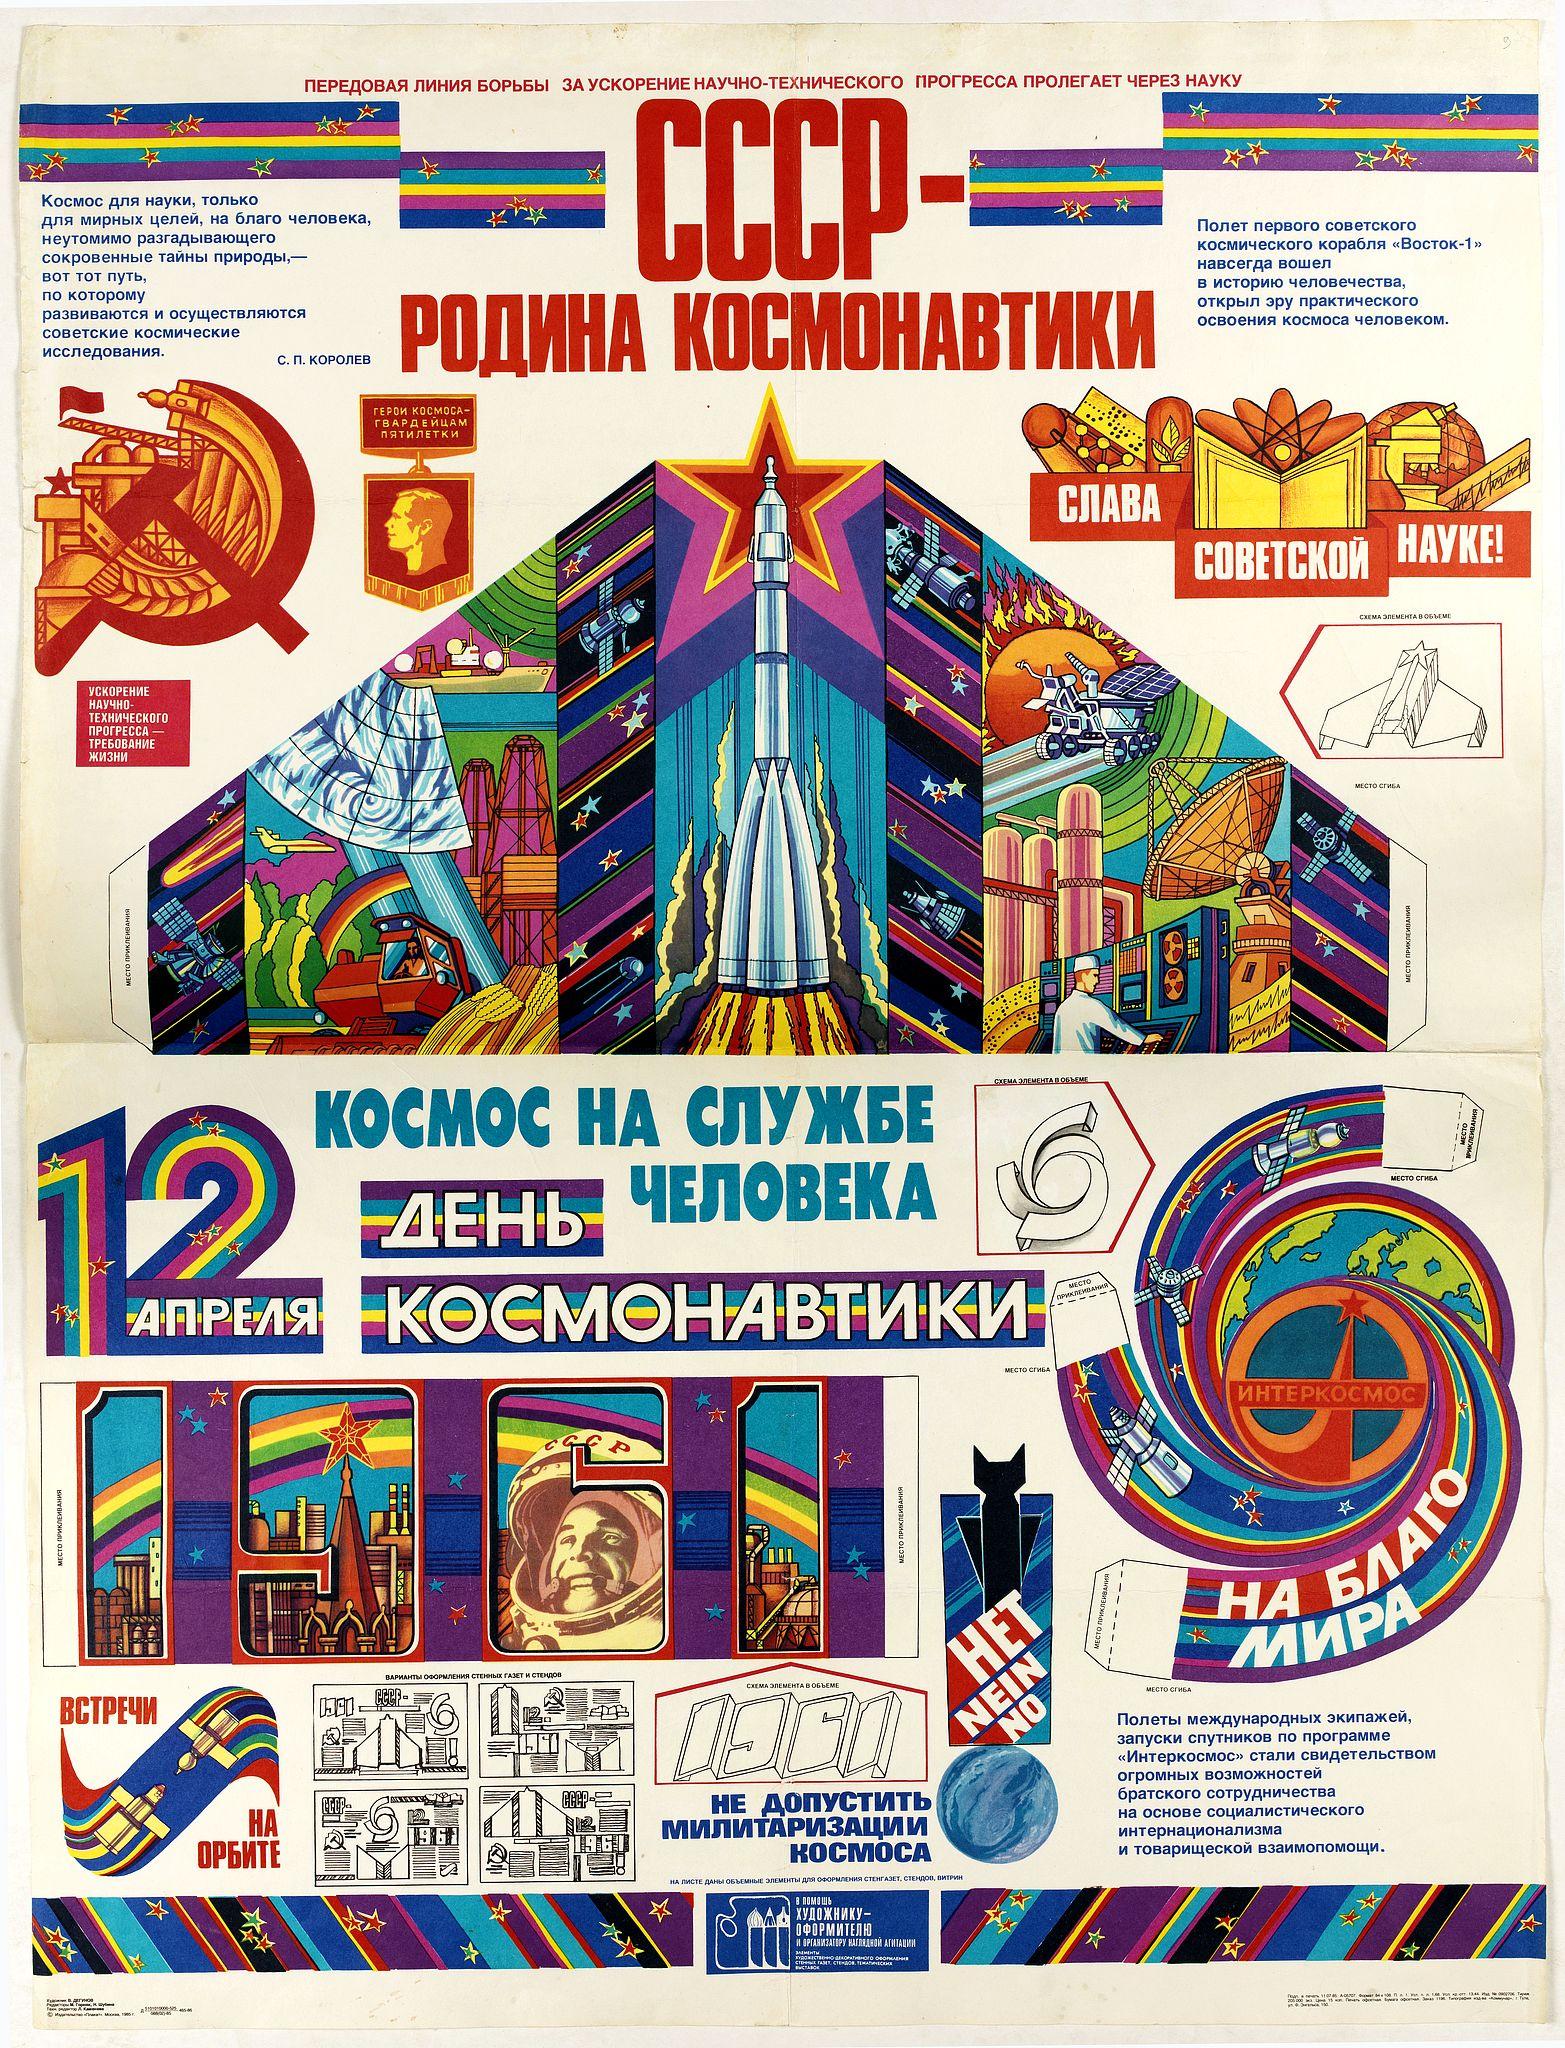 KAMENEVA, L PUBLISHING POSTER. -  [Russian poster] CCCP Homeland cosmonautics